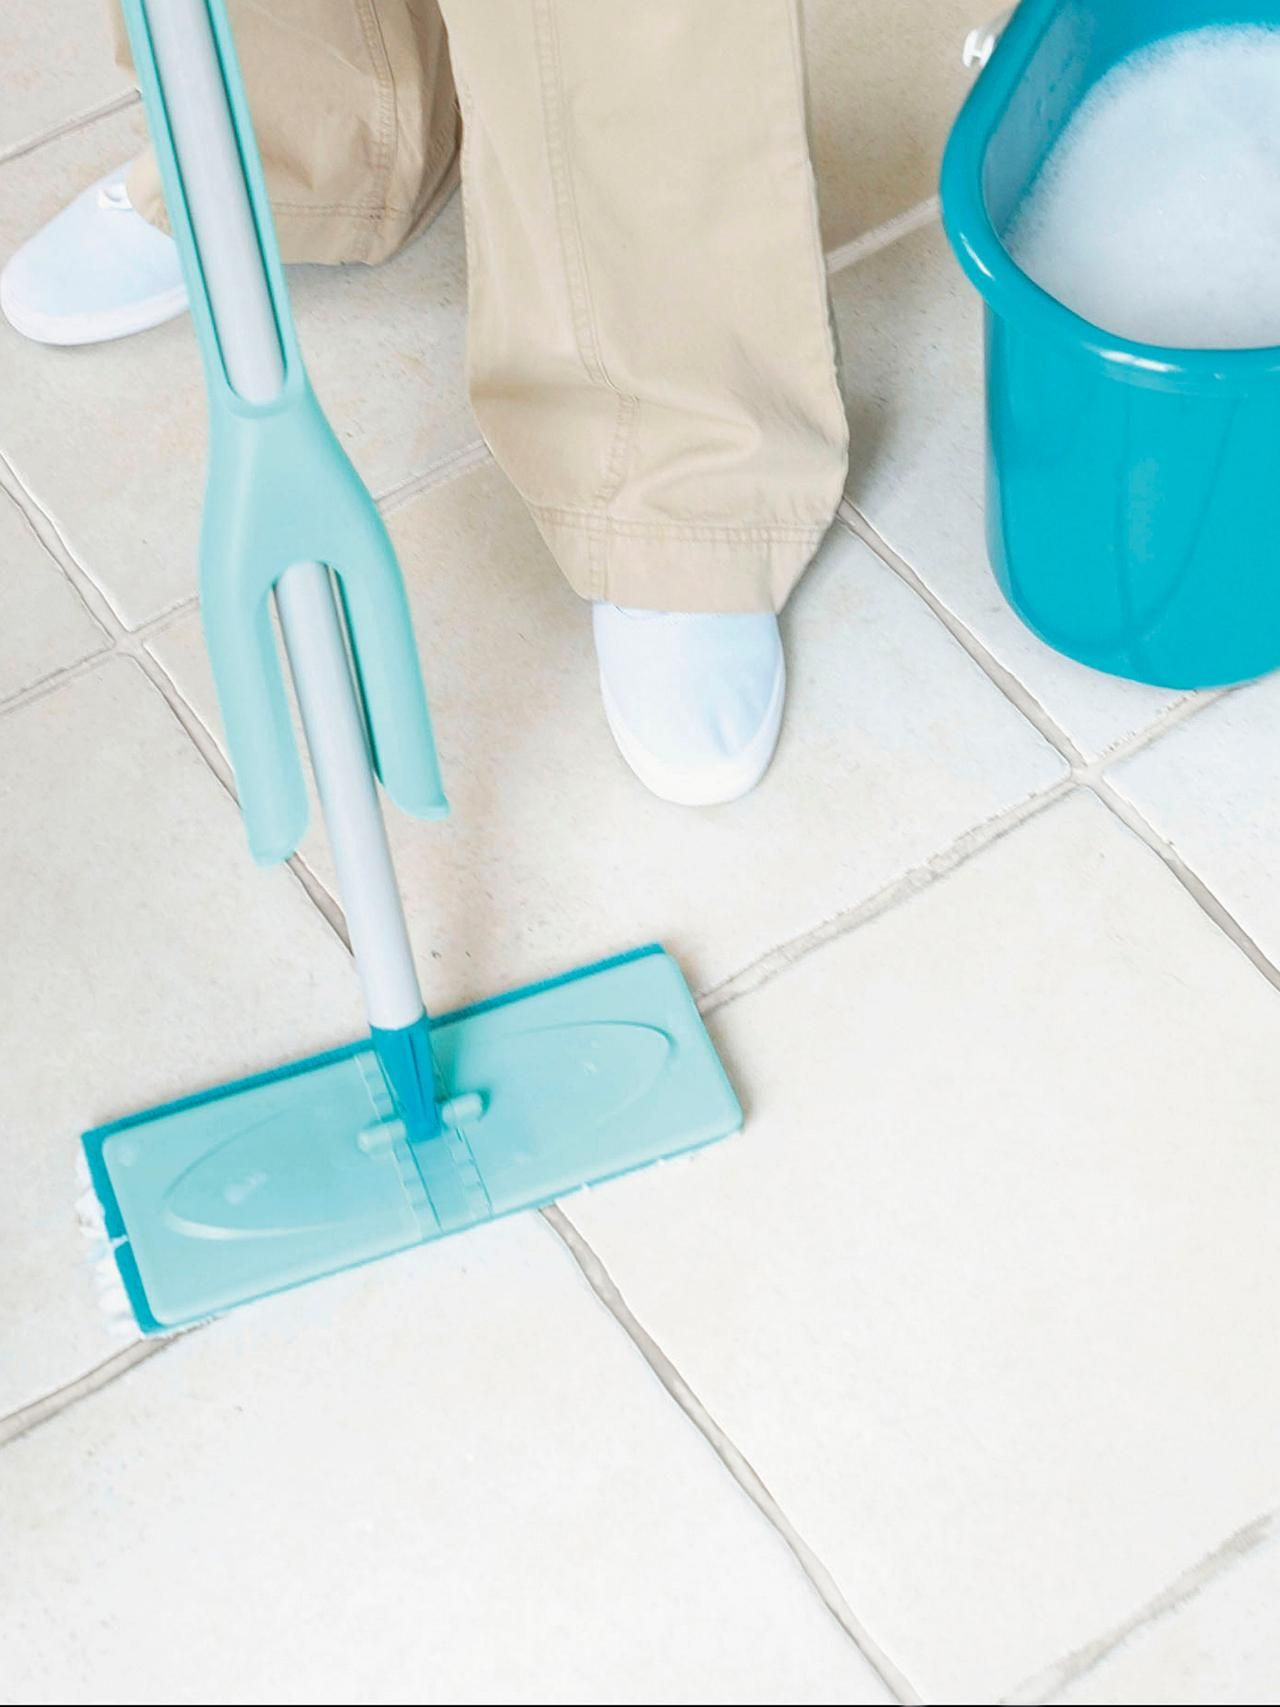 Cleaning ceramic tile floors beautiful pastel blue mopping tools cleaning ceramic tile floors beautiful pastel blue mopping tools mopping water bucket doublecrazyfo Choice Image